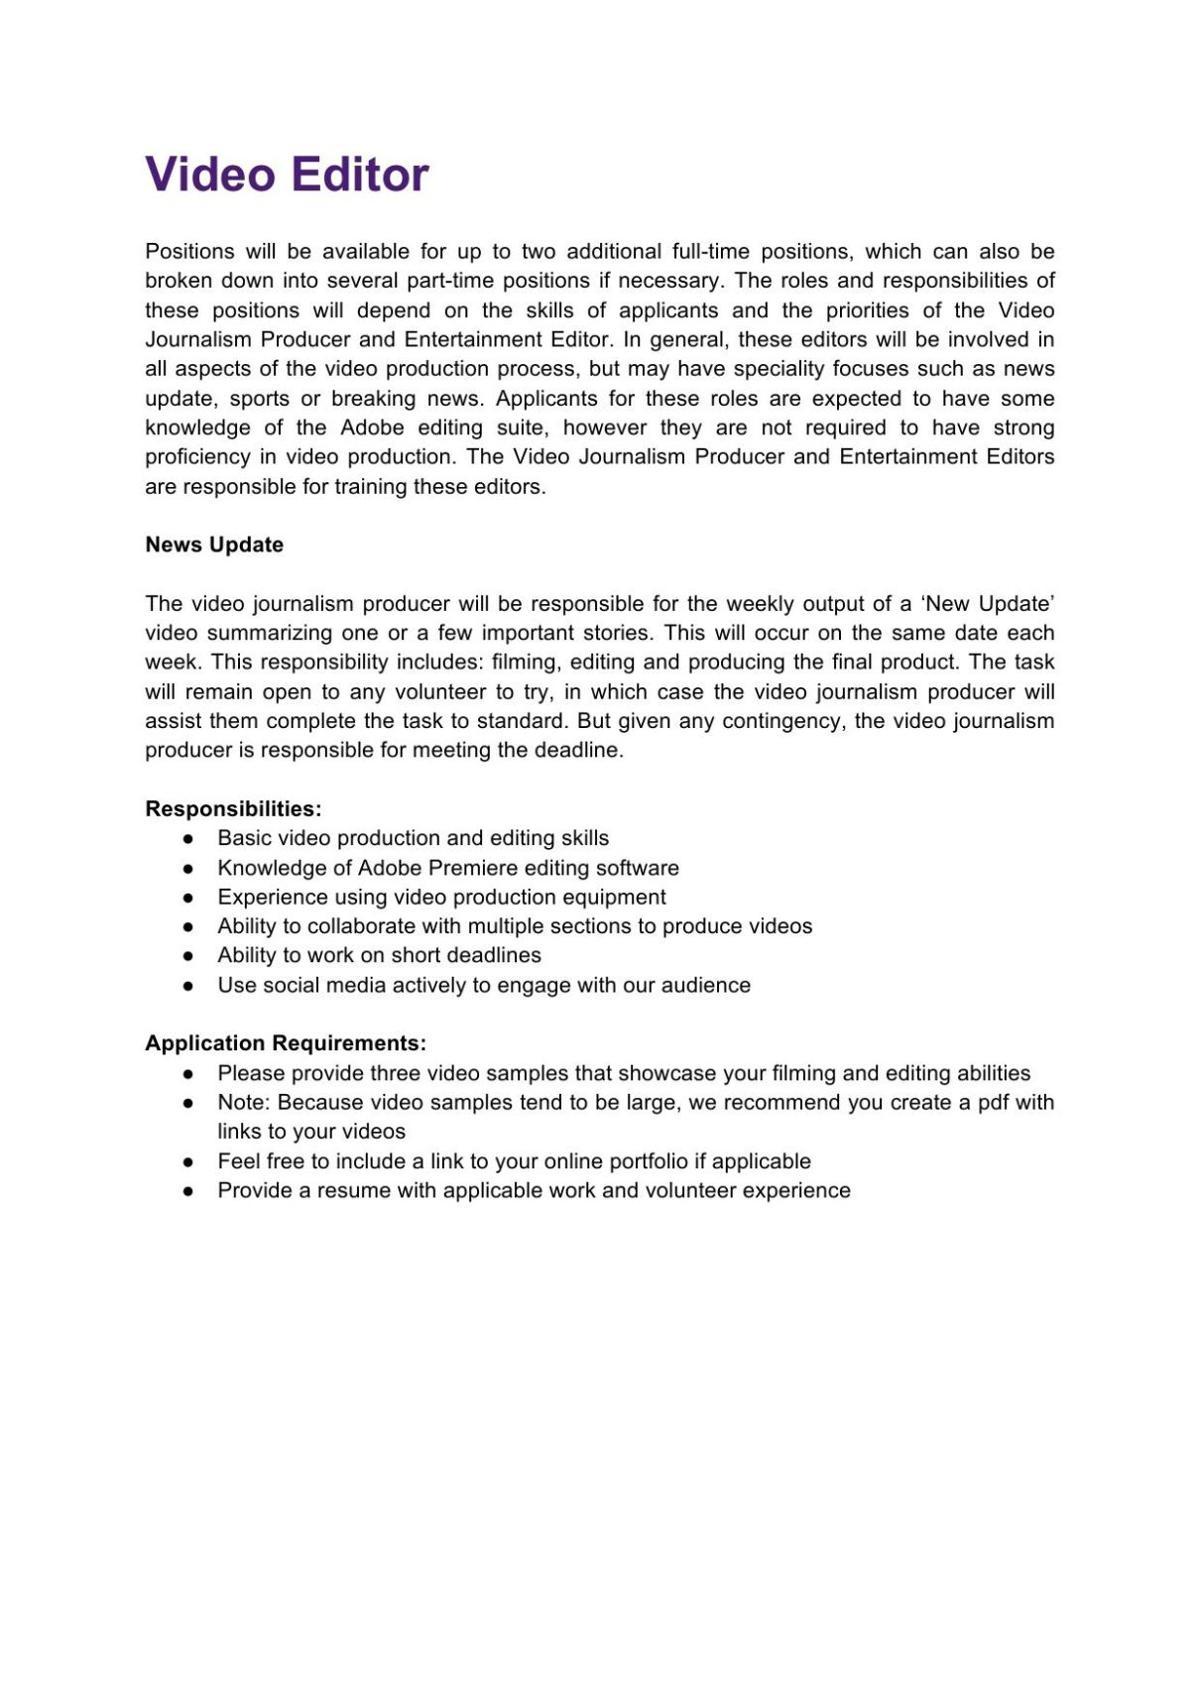 Video Editor Job Description 2020